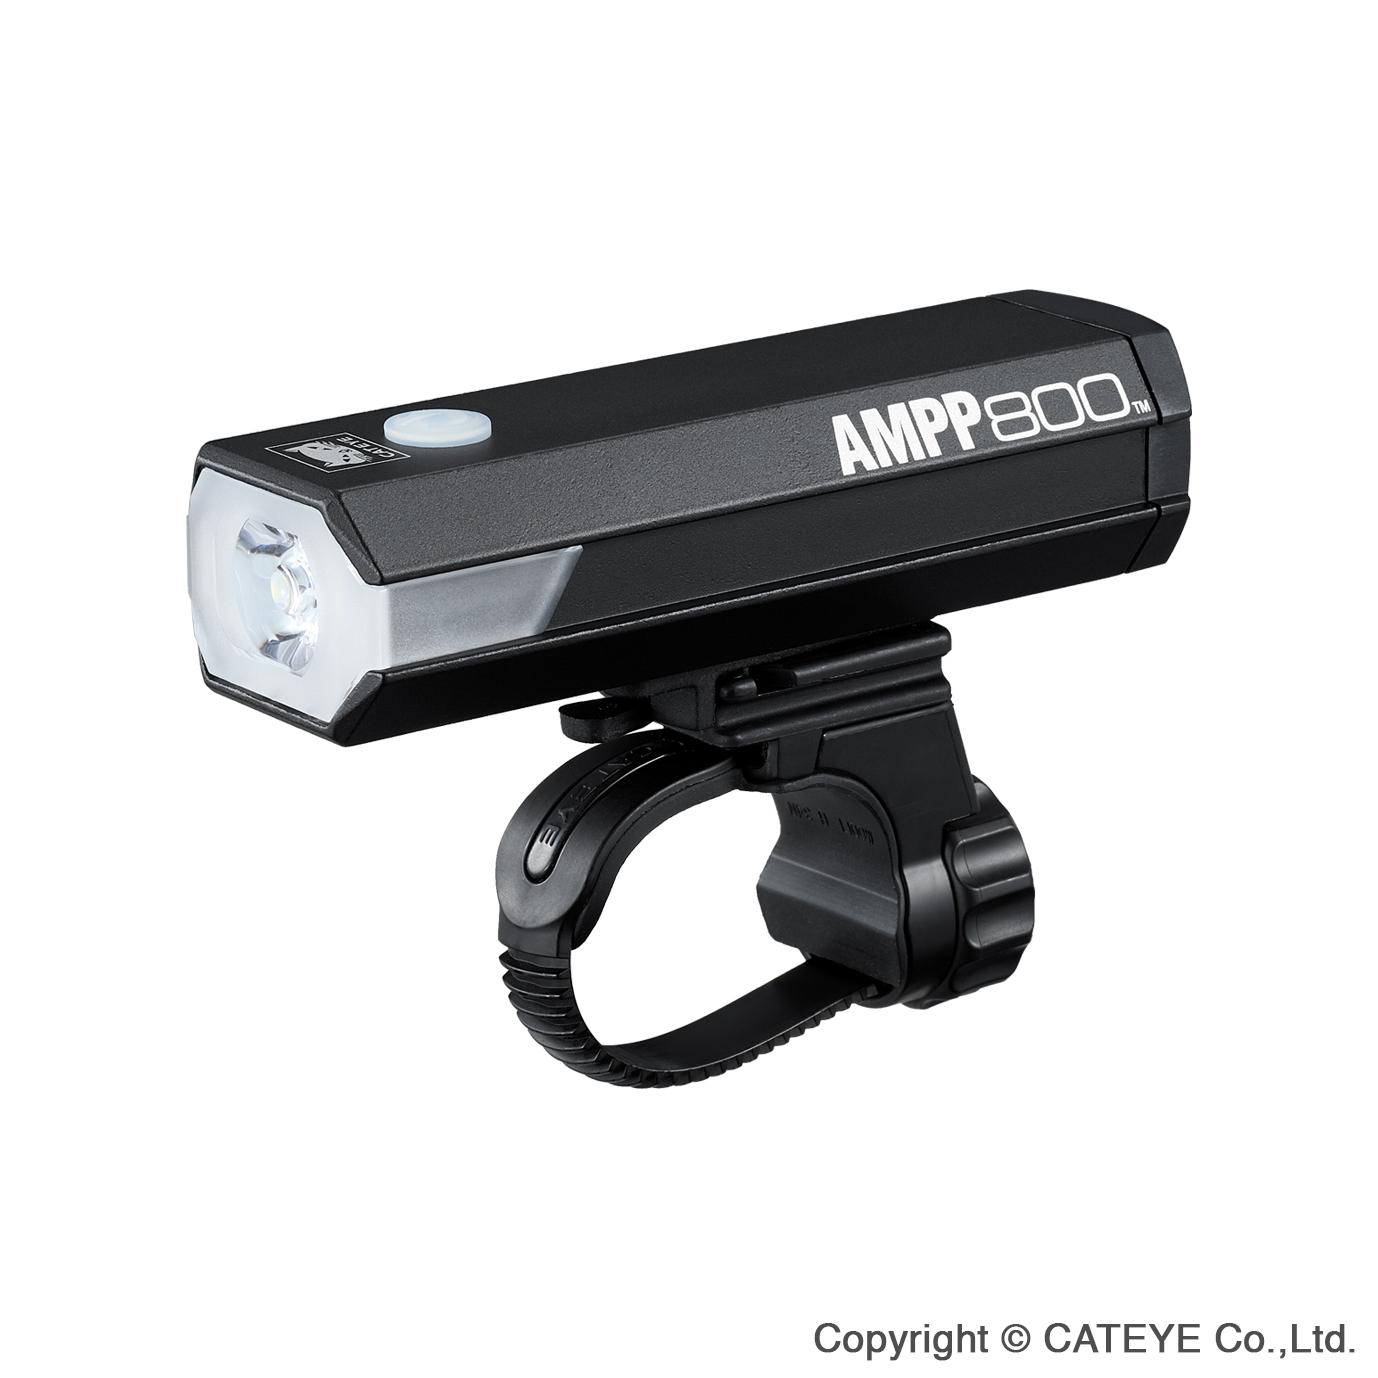 Cateye 800 AMPP